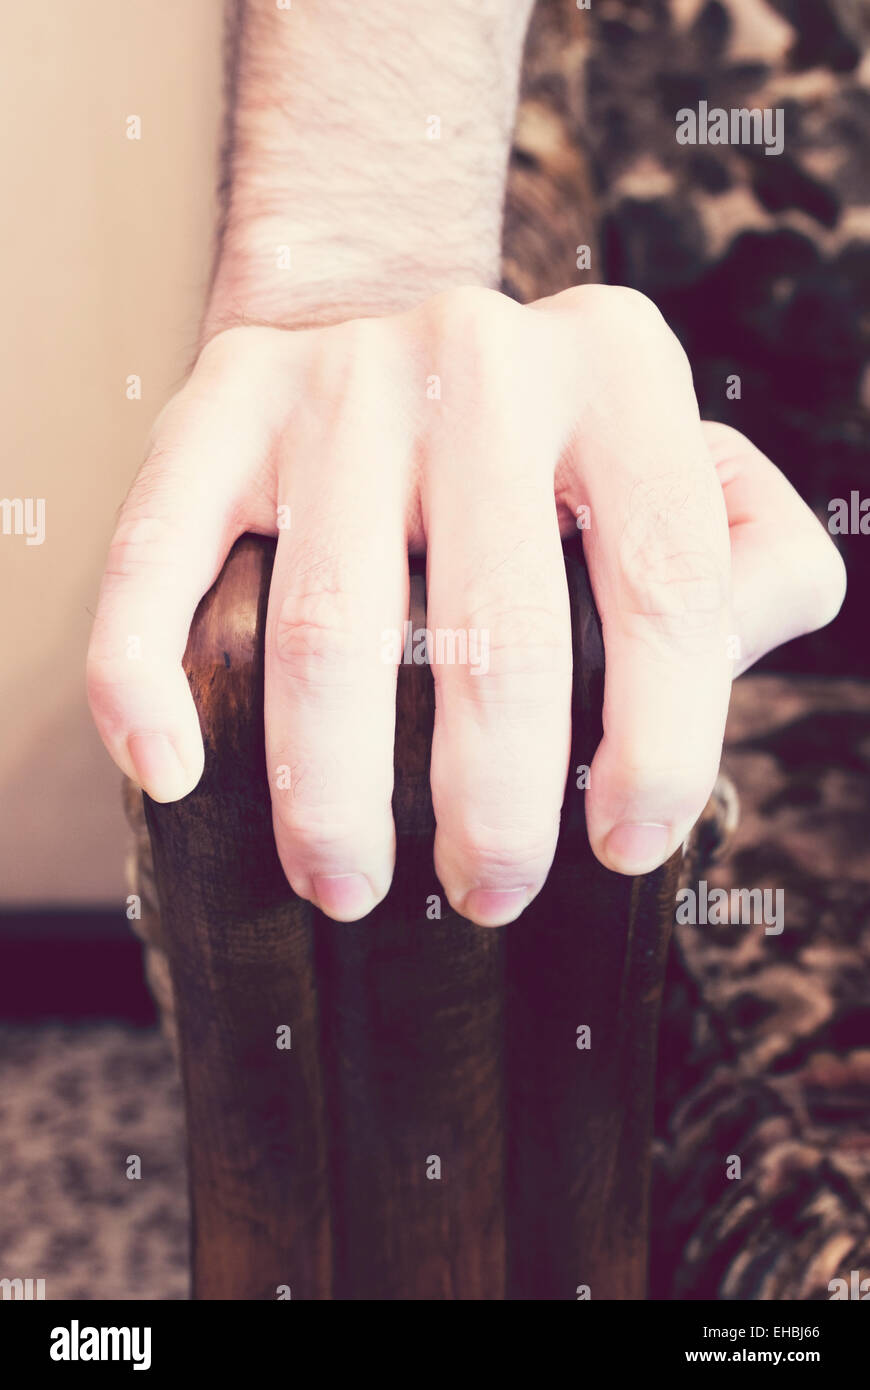 Male hand grabbing armchair - Stock Image